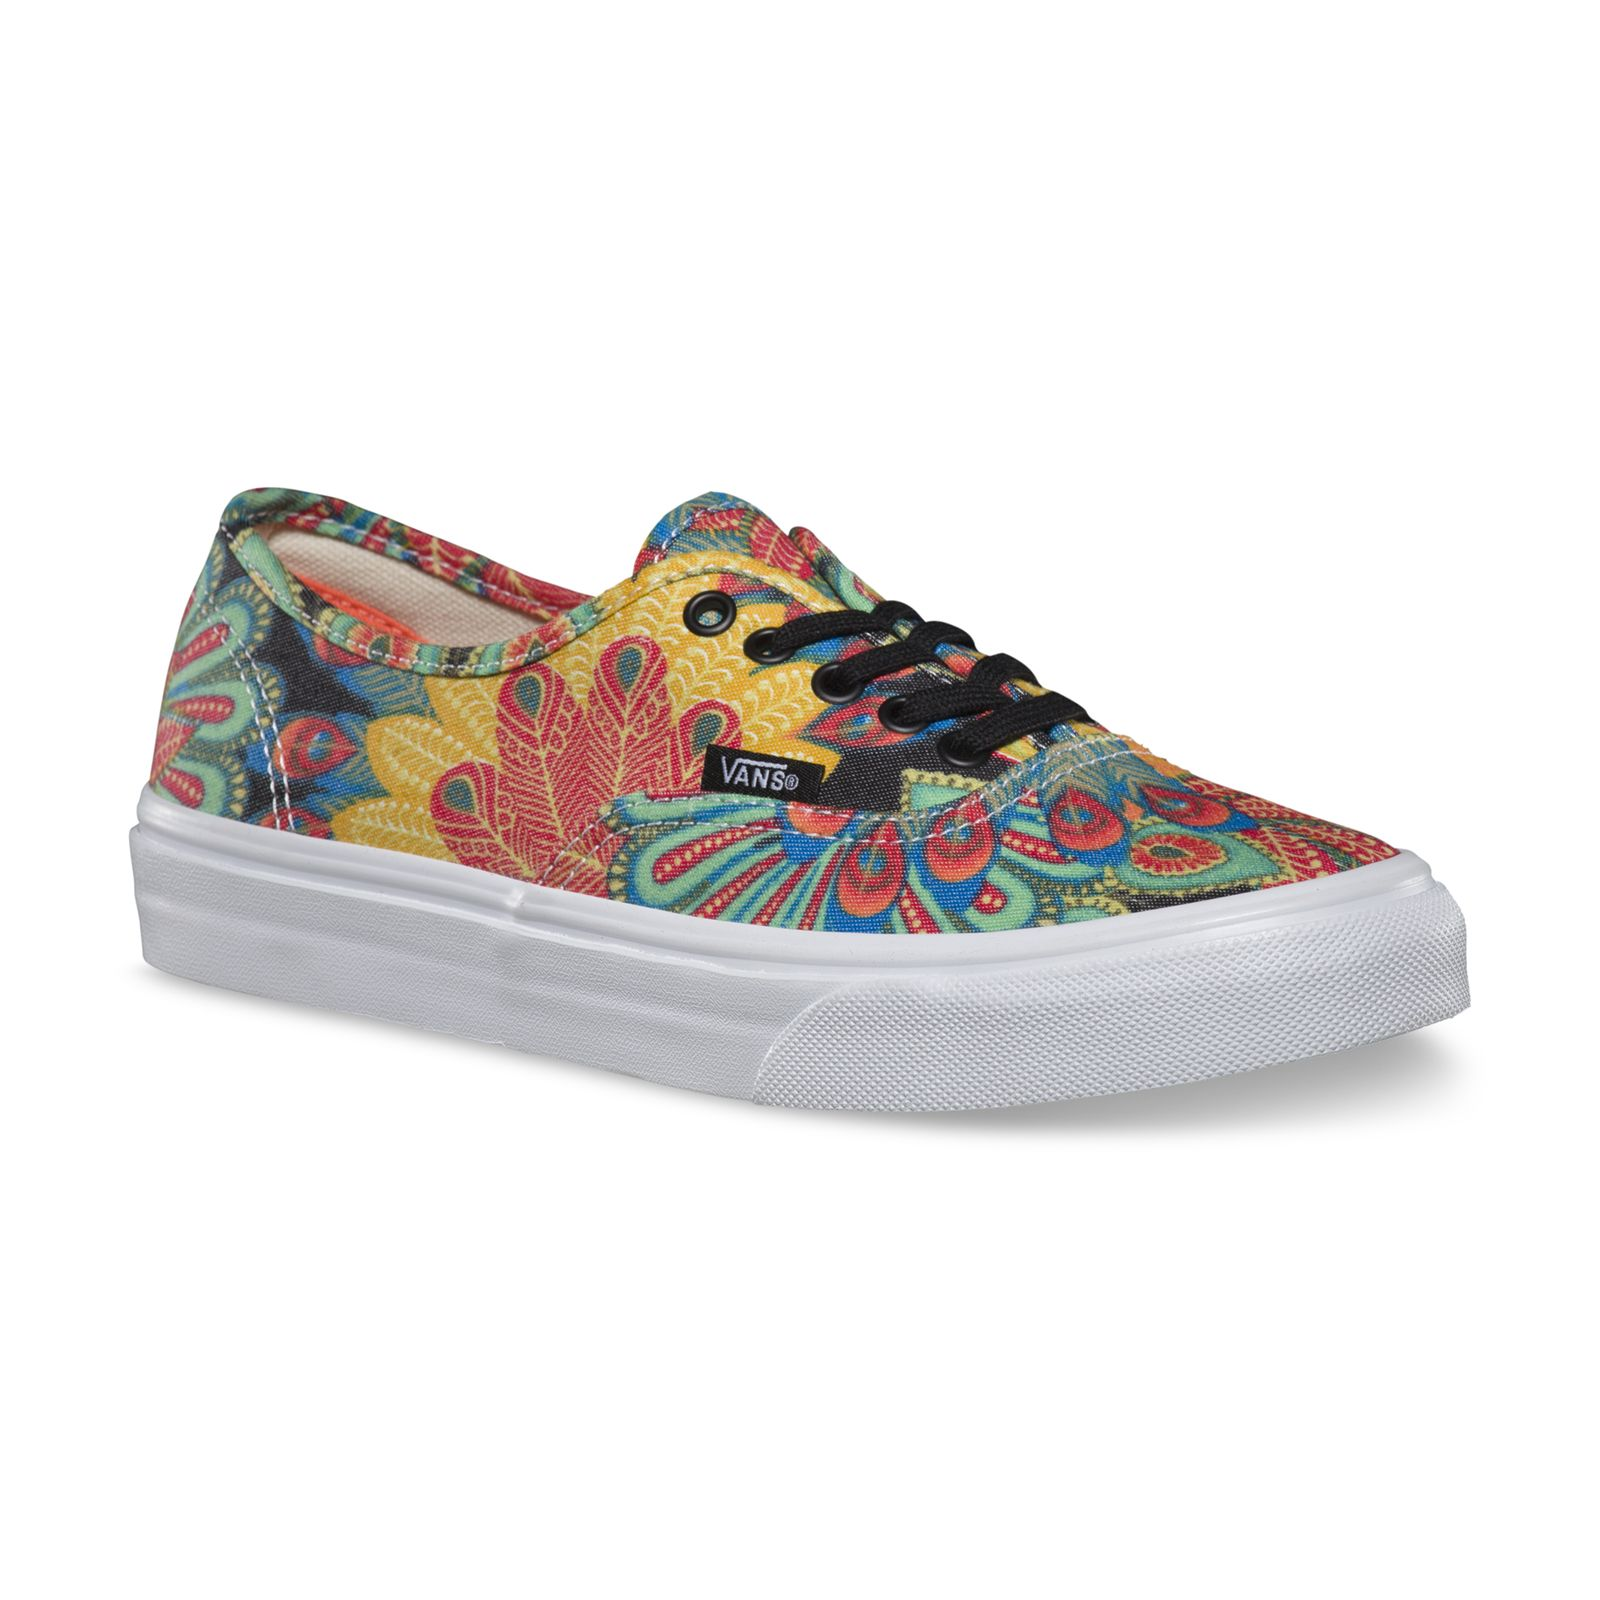 Delicate Vans Schuhe Damen Vans Atwood Low Ditsy Canvas